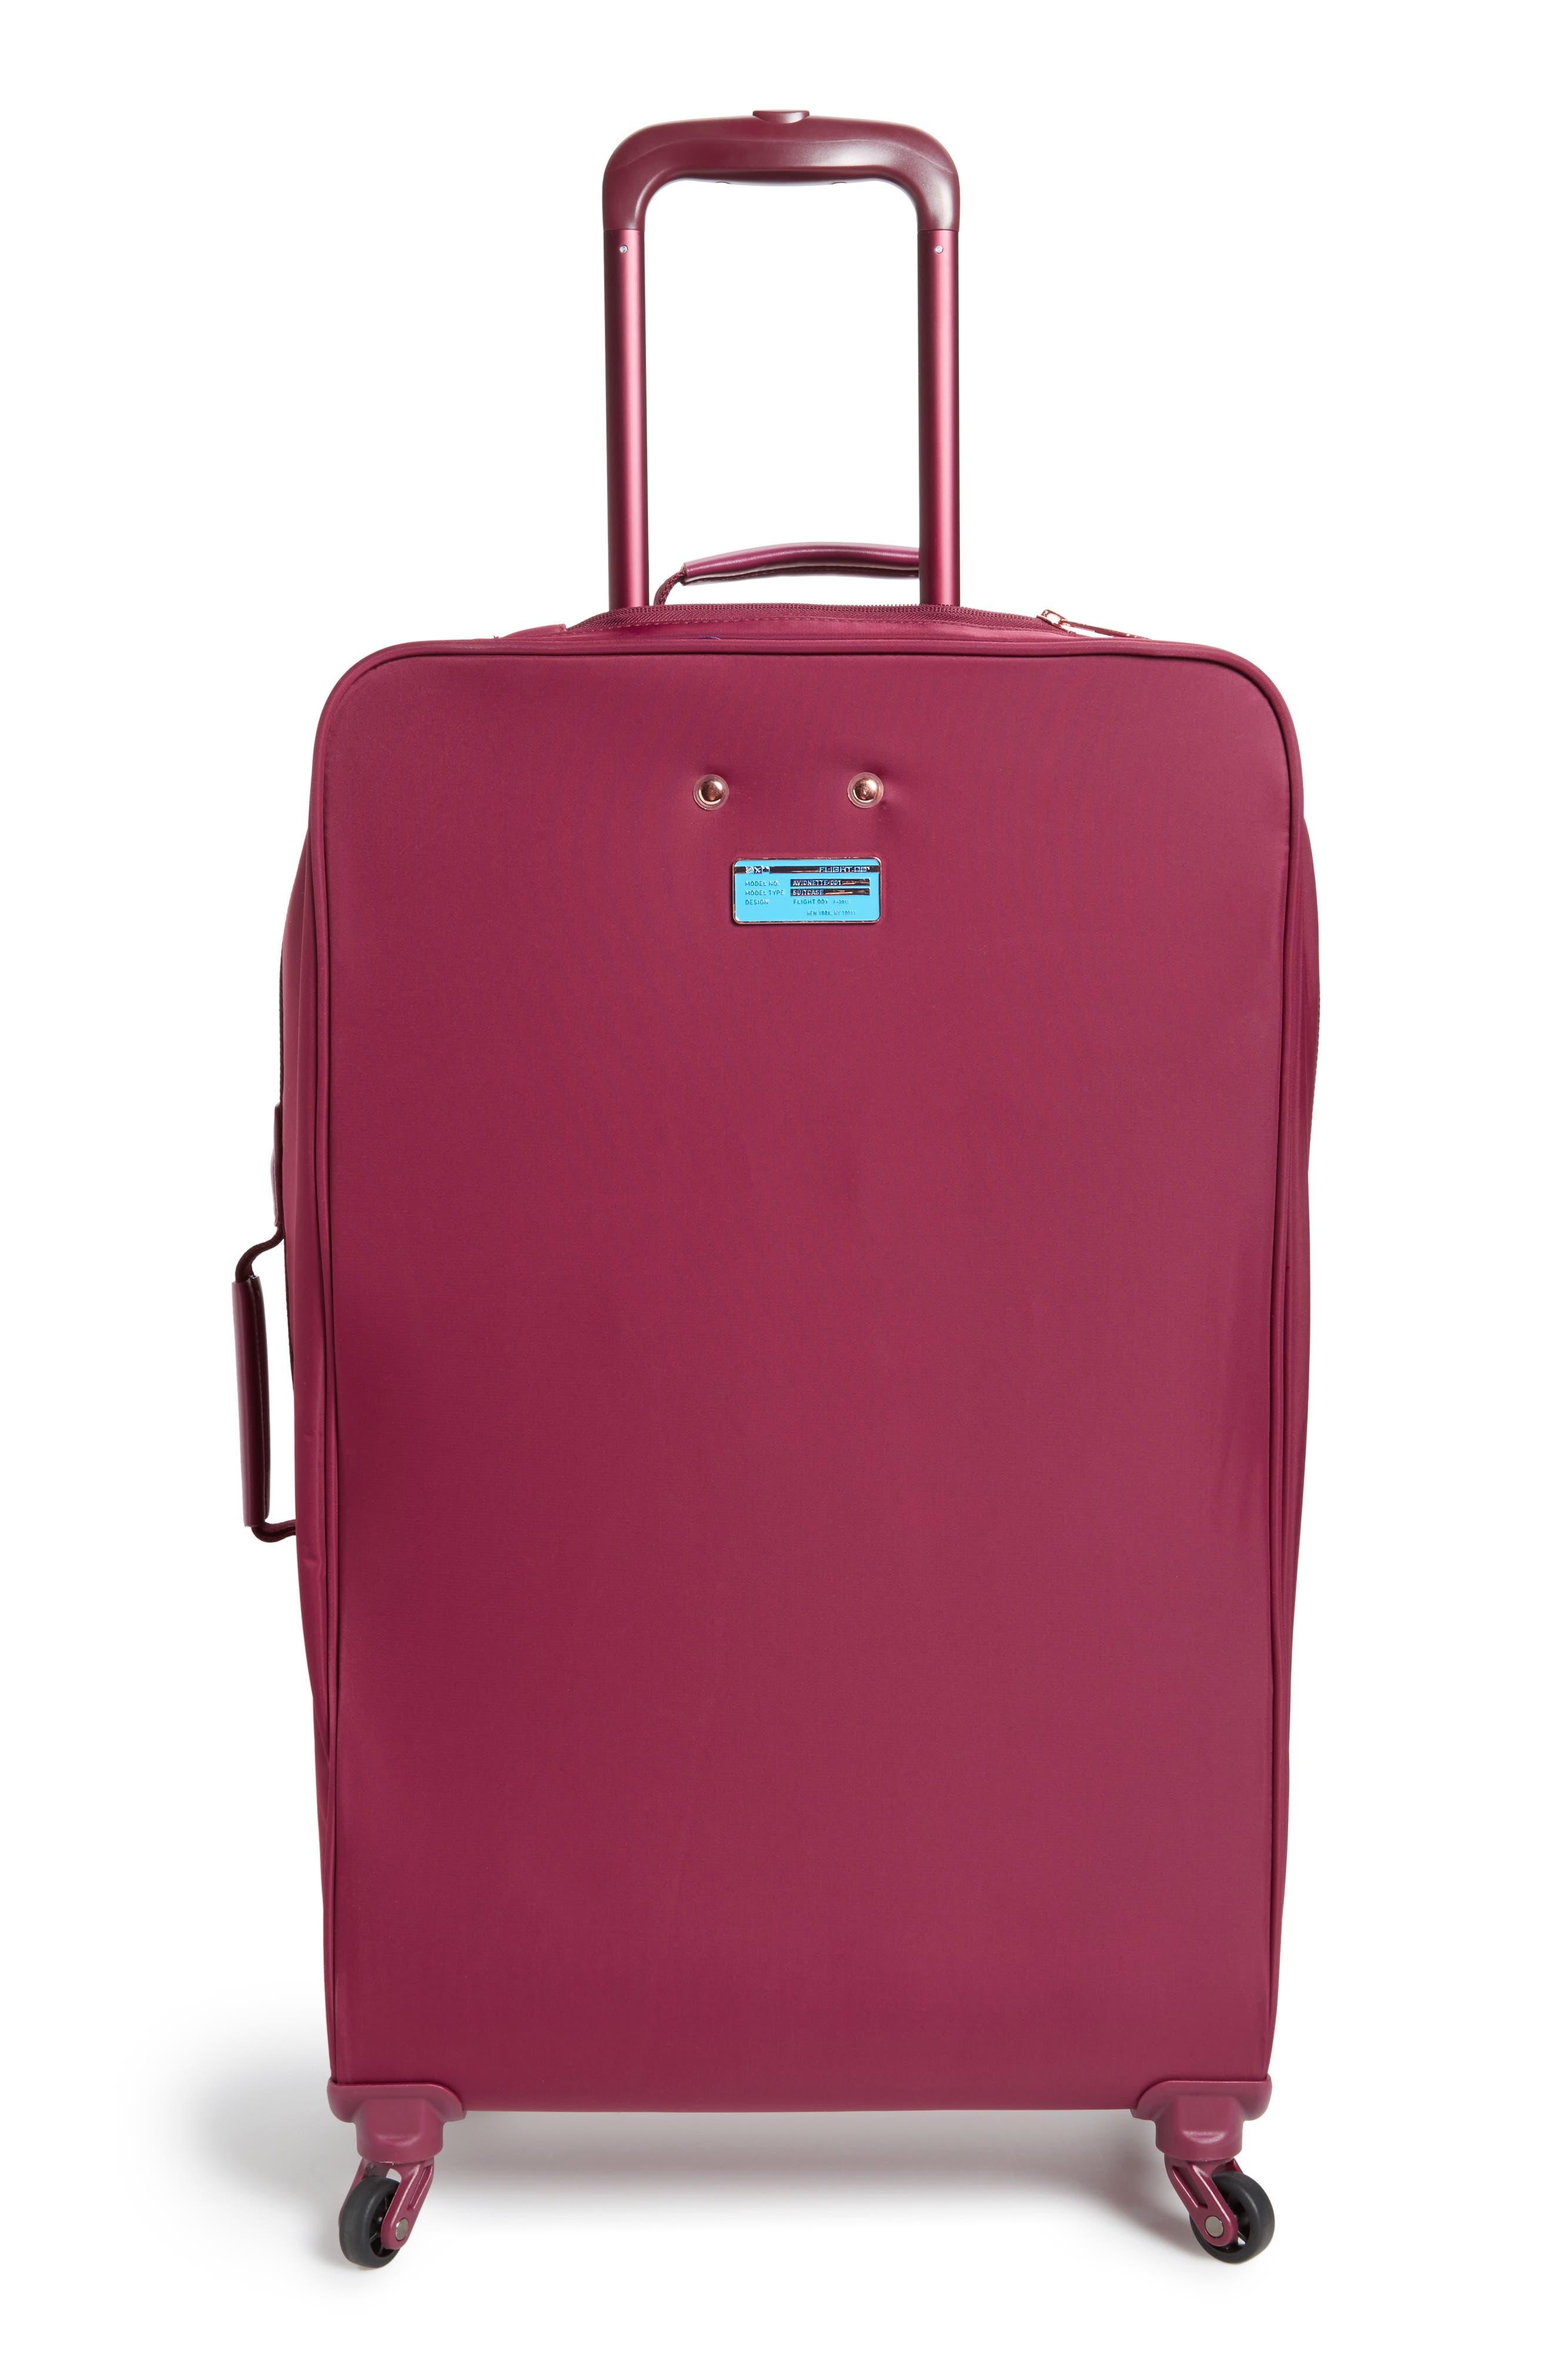 Avionette 26-Inch Rolling Suitcase,                             Alternate thumbnail 4, color,                             930